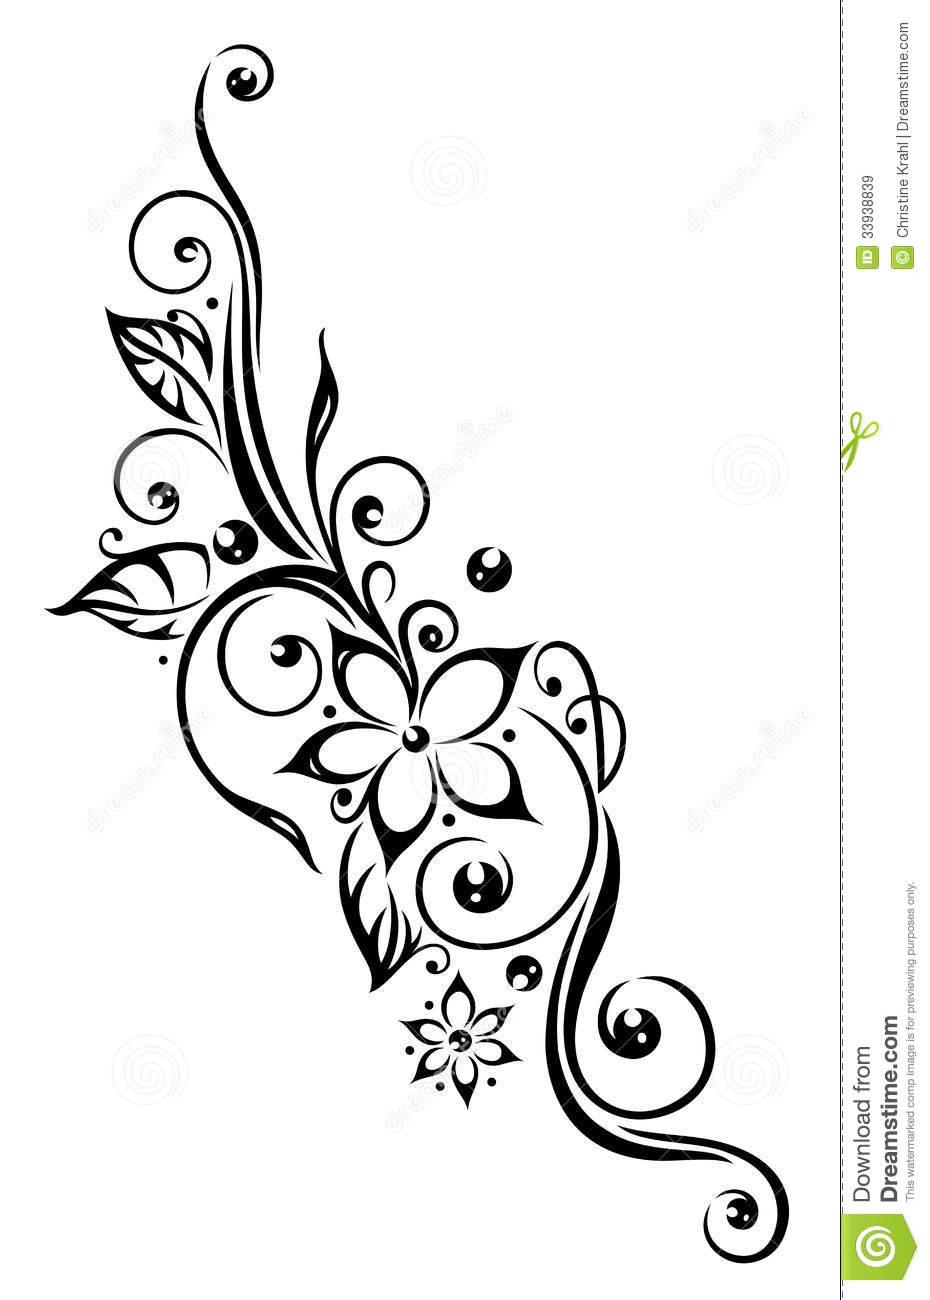 Floral clipart tribal Google flower tattoo lotus ideas